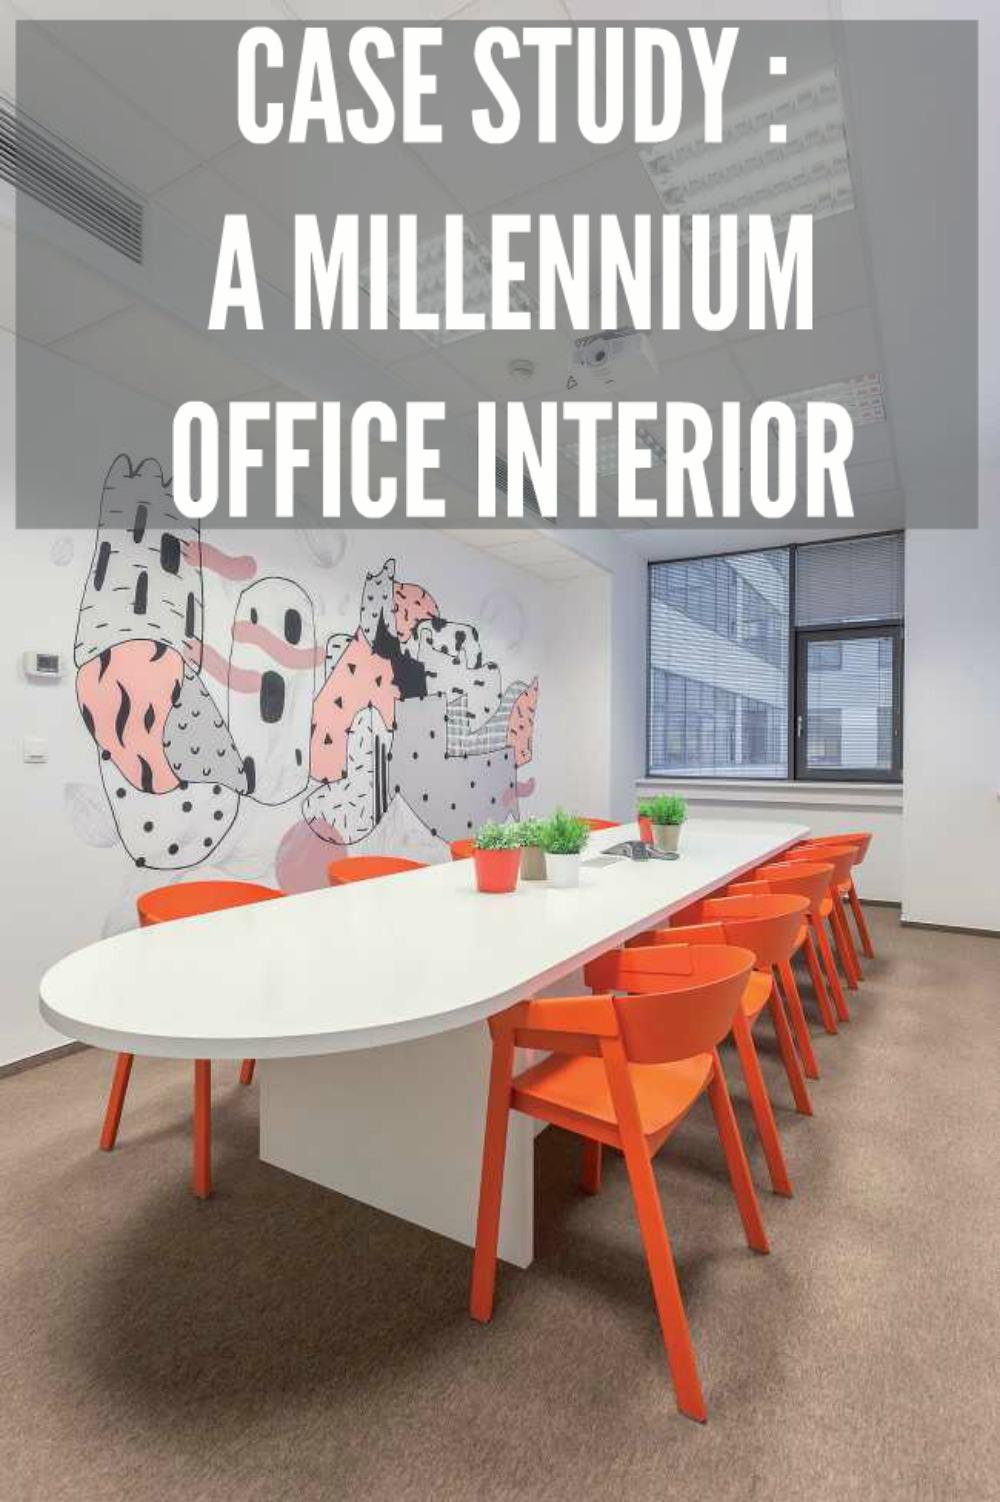 Case Study A Millennium Office Interior Smarter Surfaces Blog